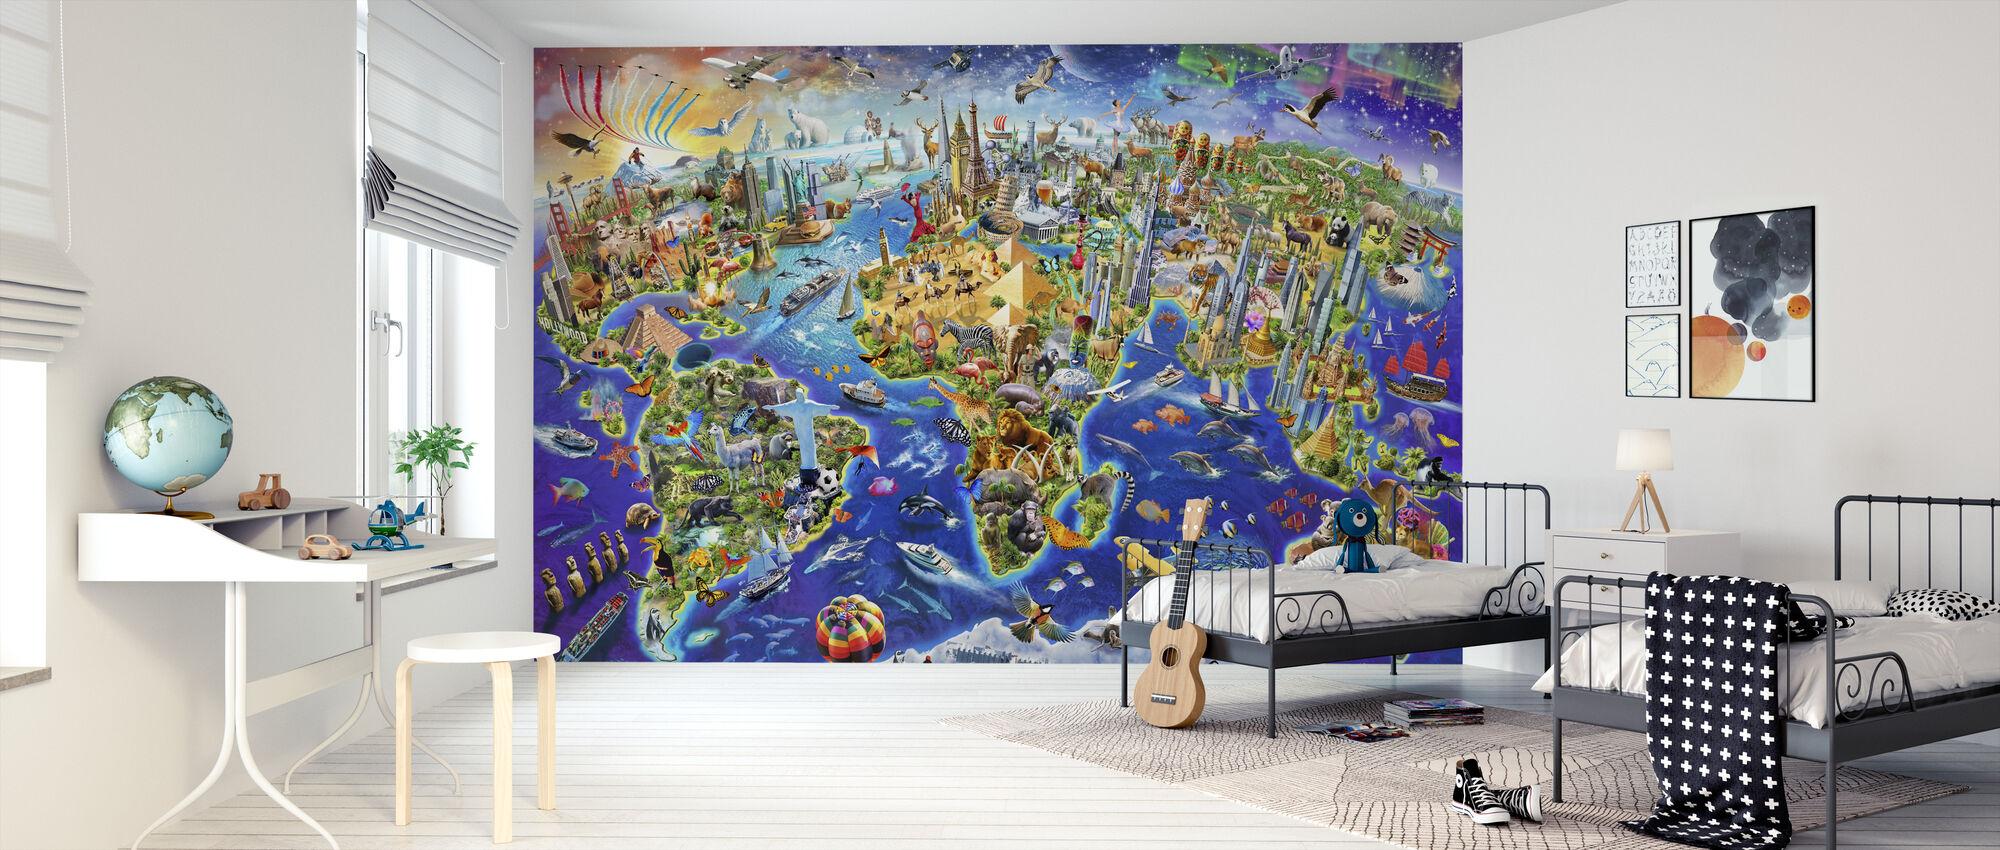 Crazy World - Wallpaper - Kids Room